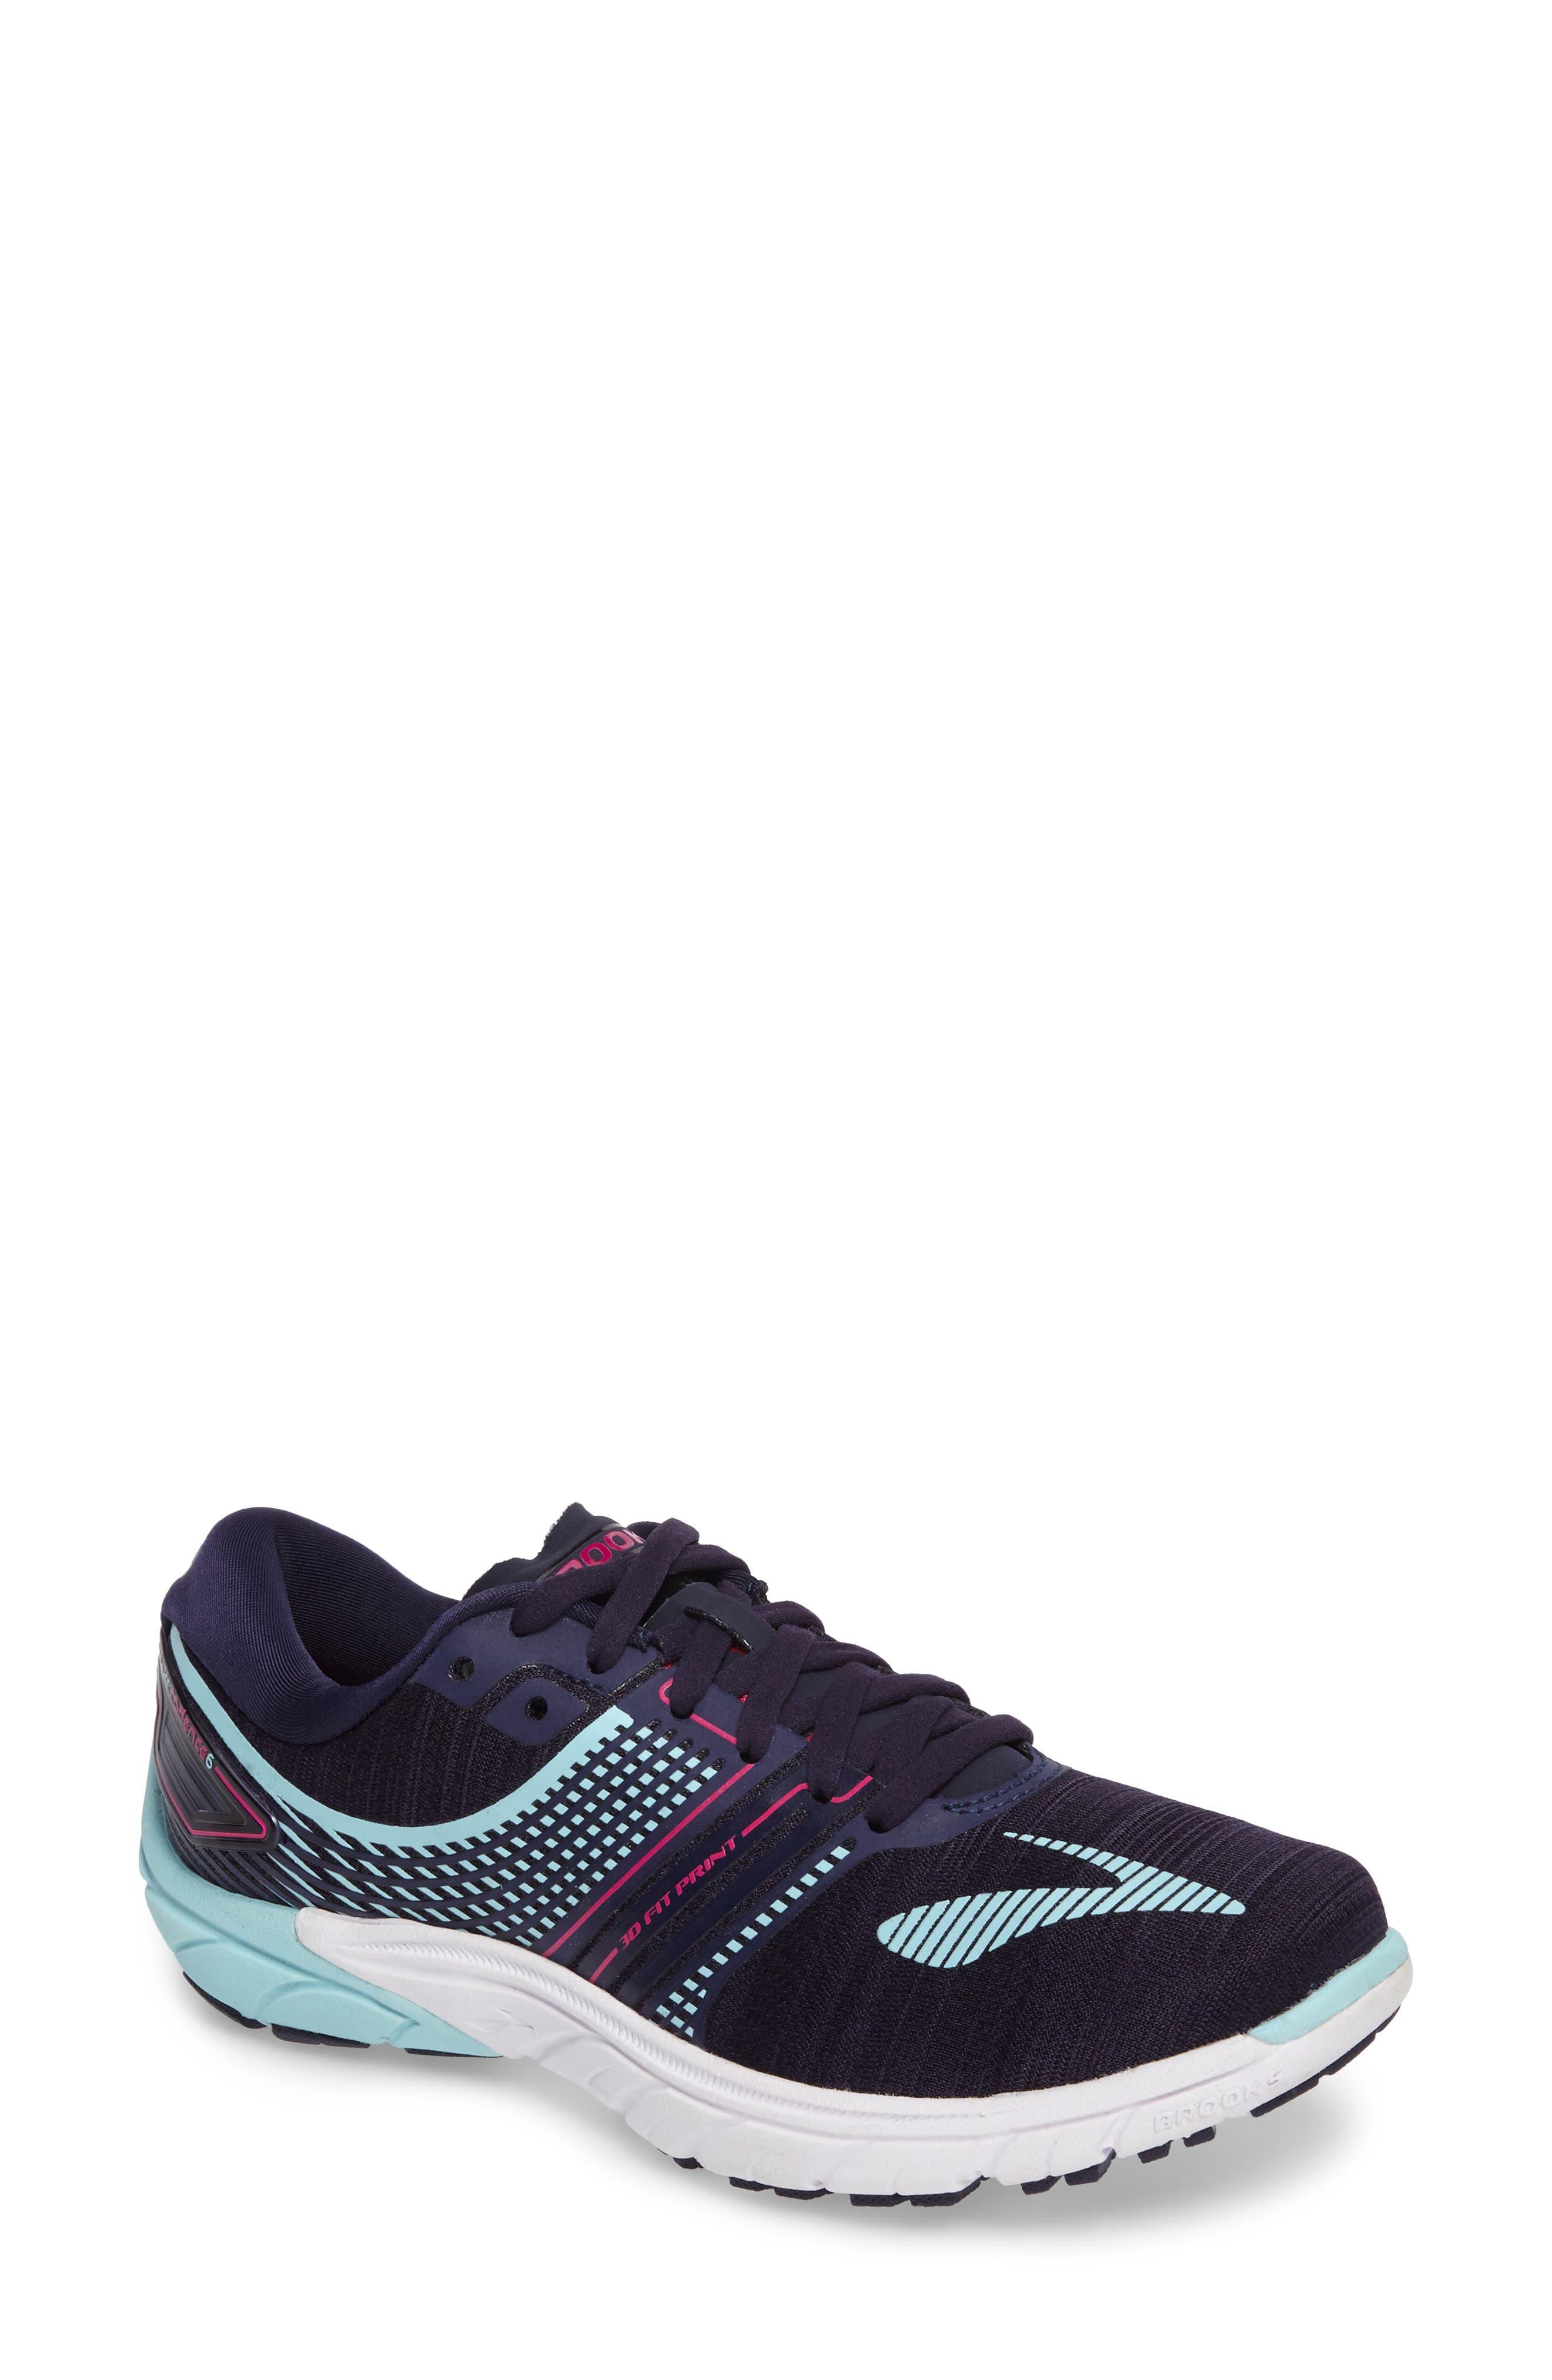 PureCadence 6 Running Shoe,                             Main thumbnail 1, color,                             435